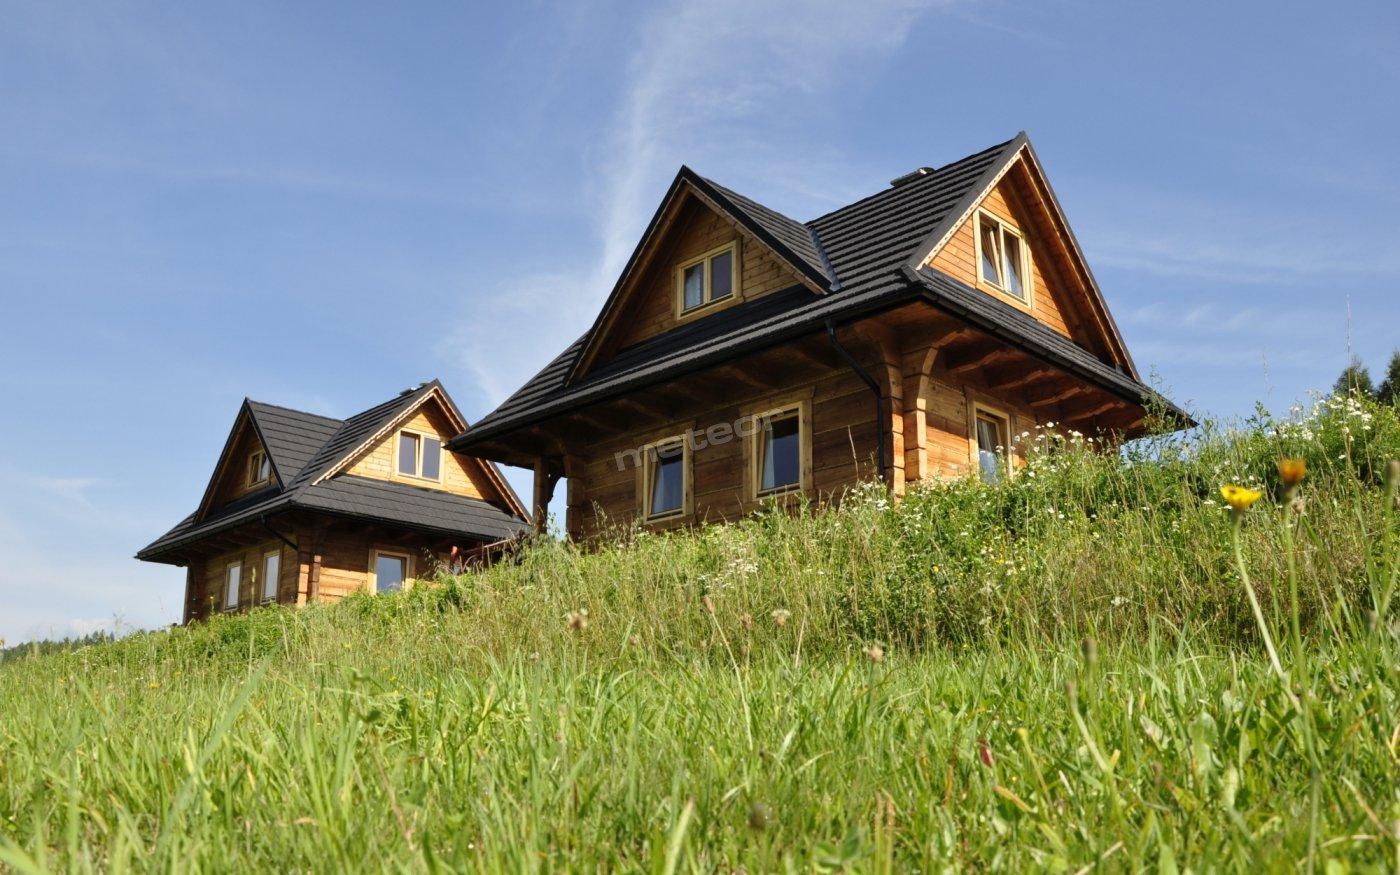 Domki Widokówka